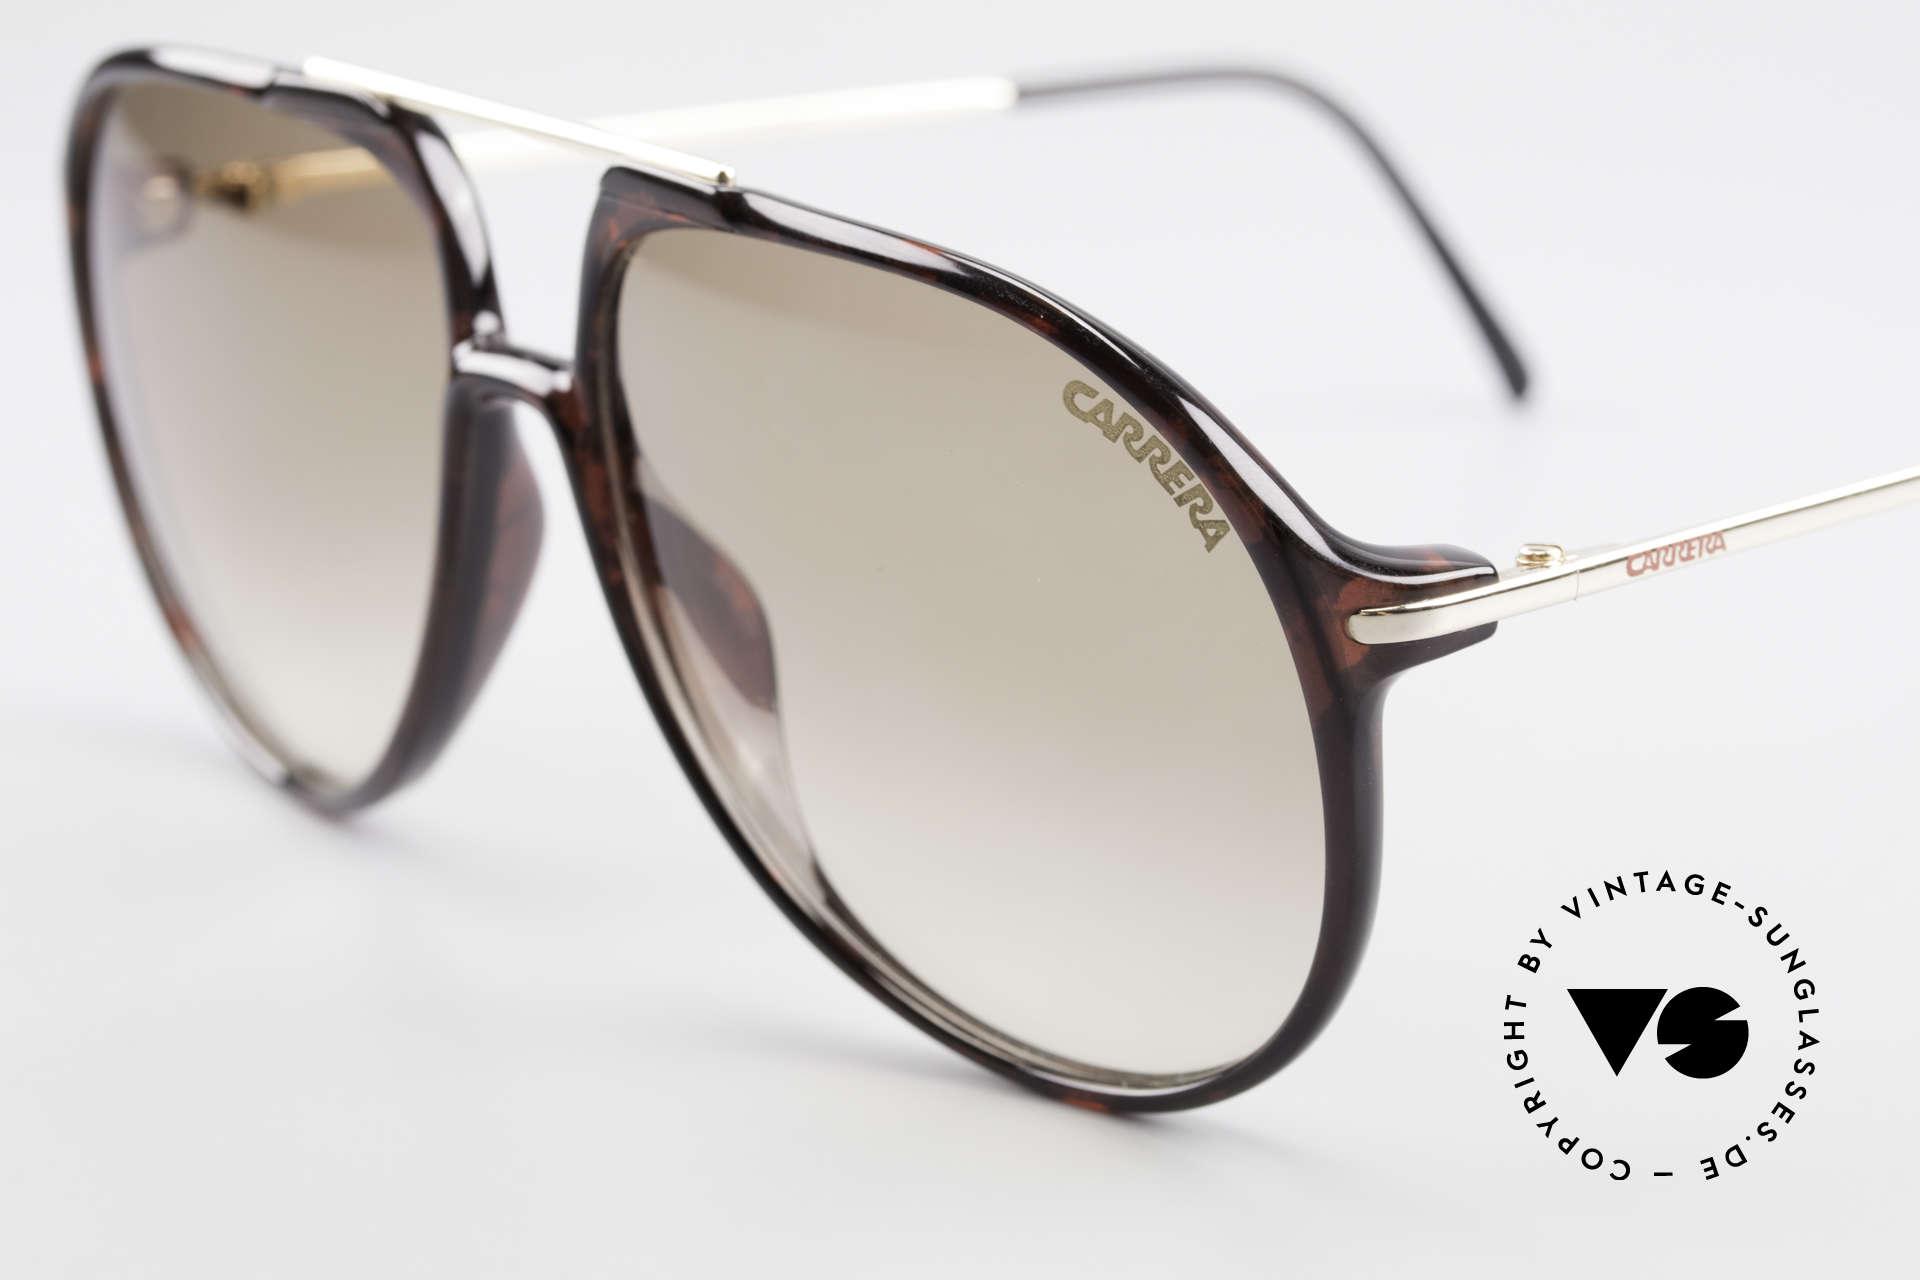 d3711c8957b71 Sunglasses Carrera 5327 80 s Aviator Shades Optyl